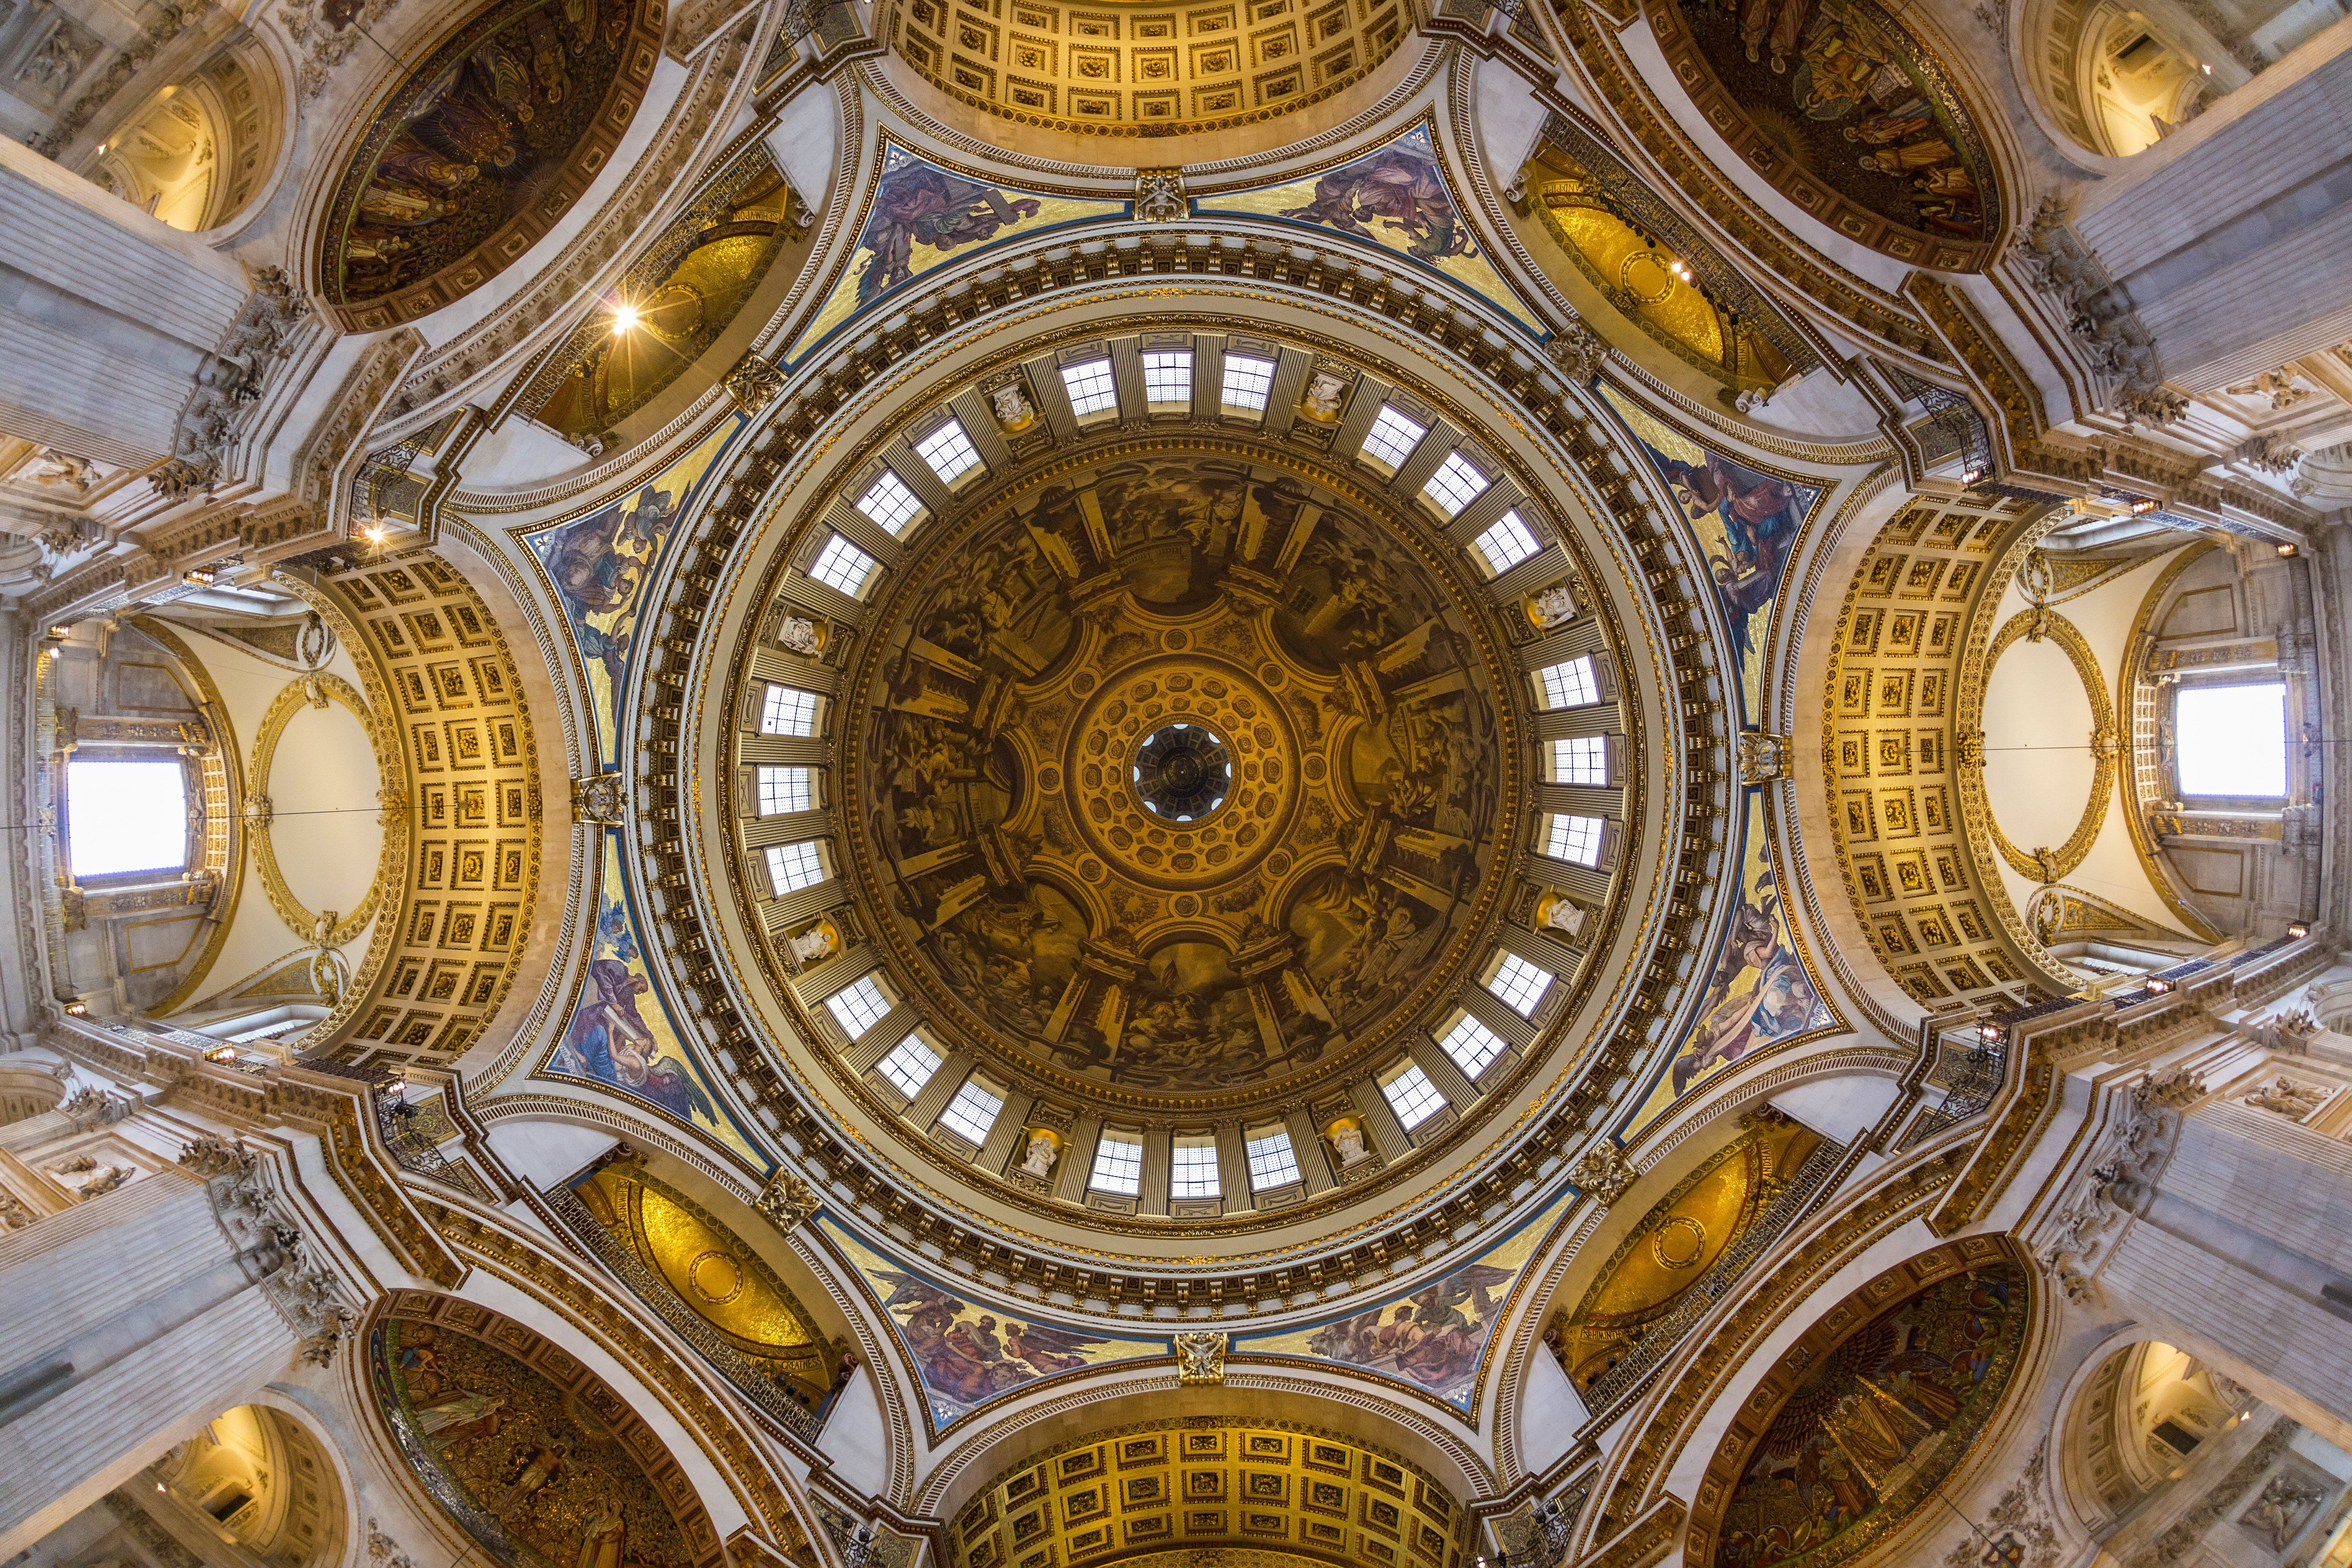 interior, looking up at ornate interior of dome, windows around bottom, window areas surrounding dome windows